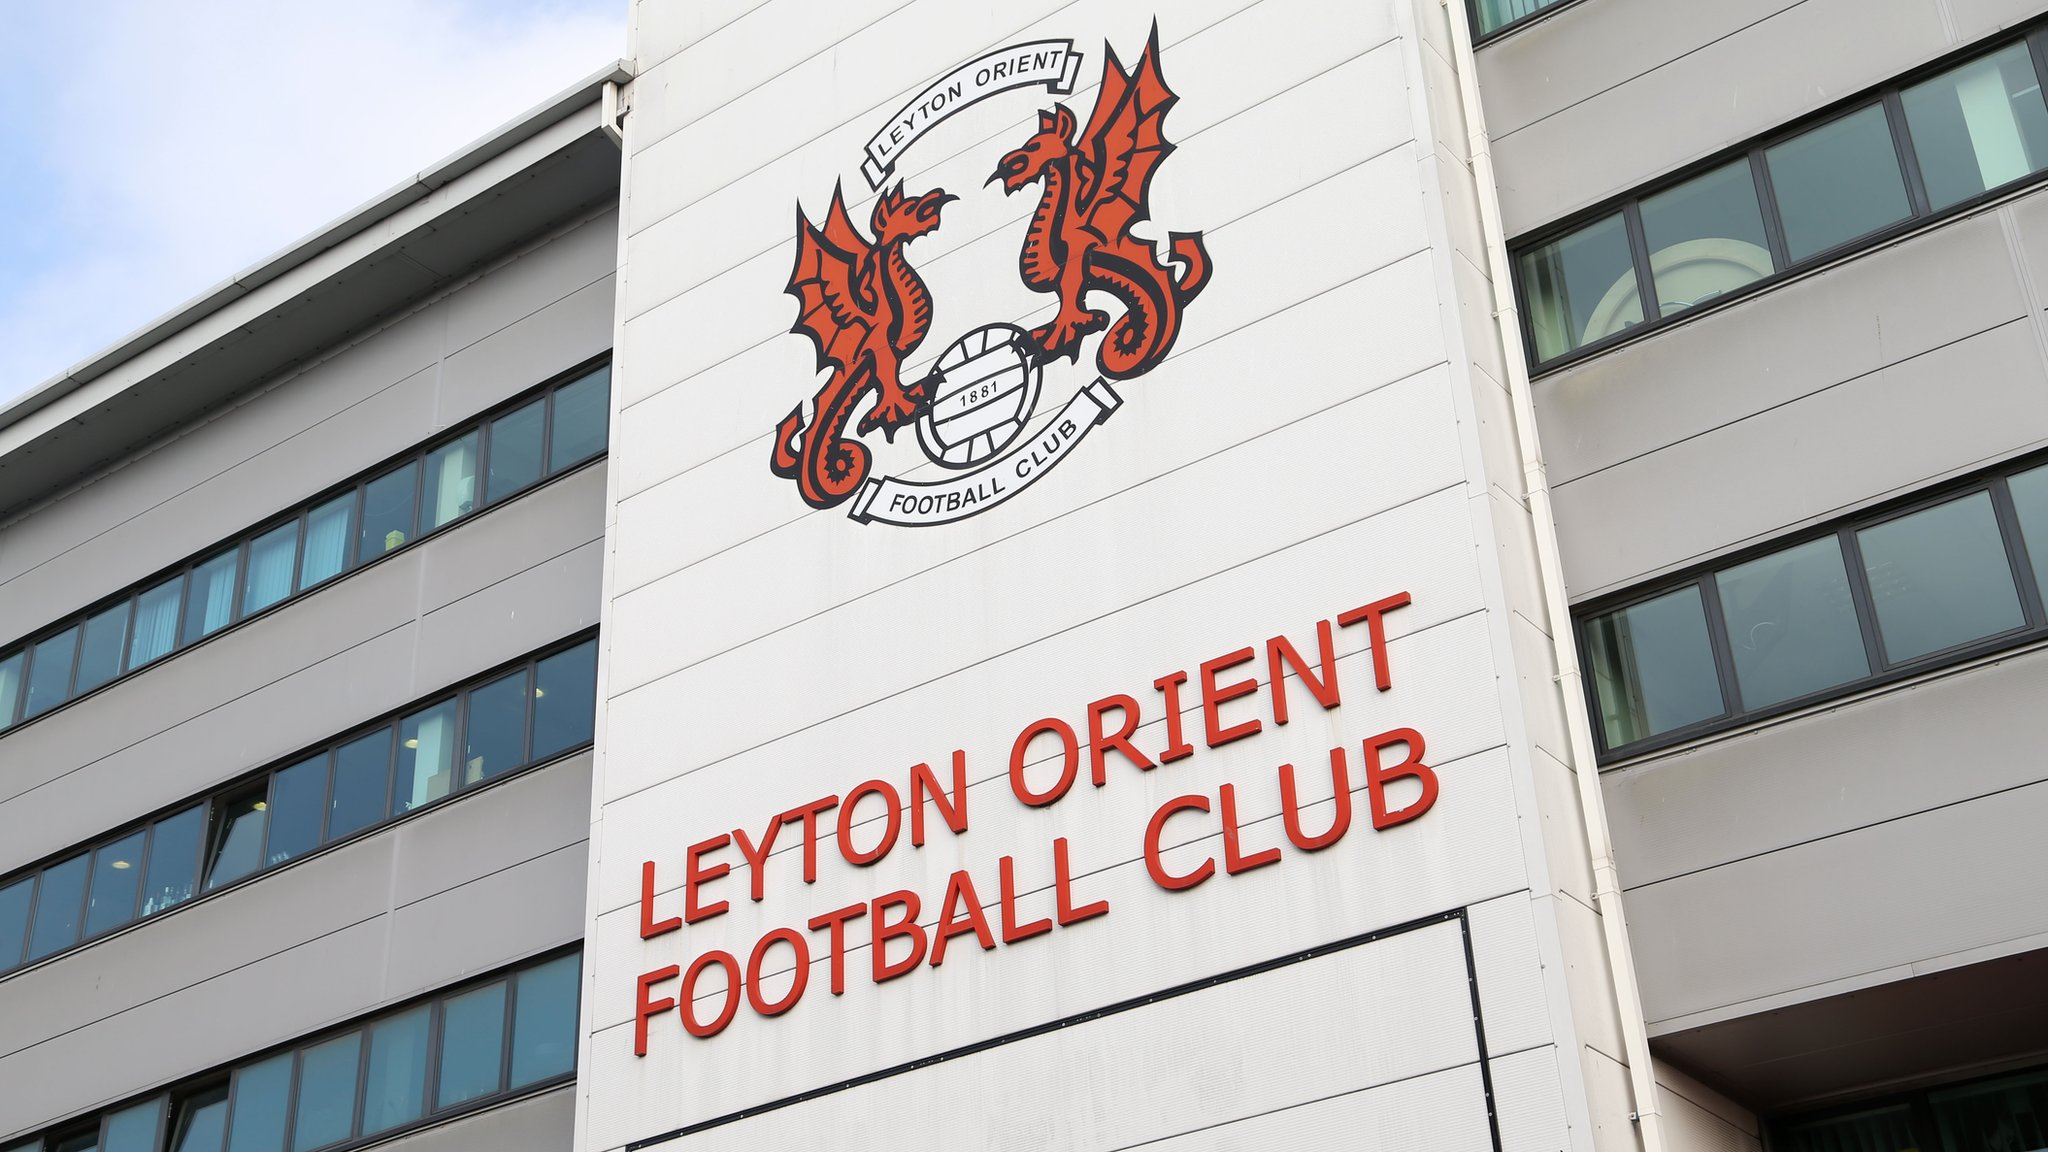 Leyton Orient: Unpaid staff had 'no communication' from owner Francesco Becchetti